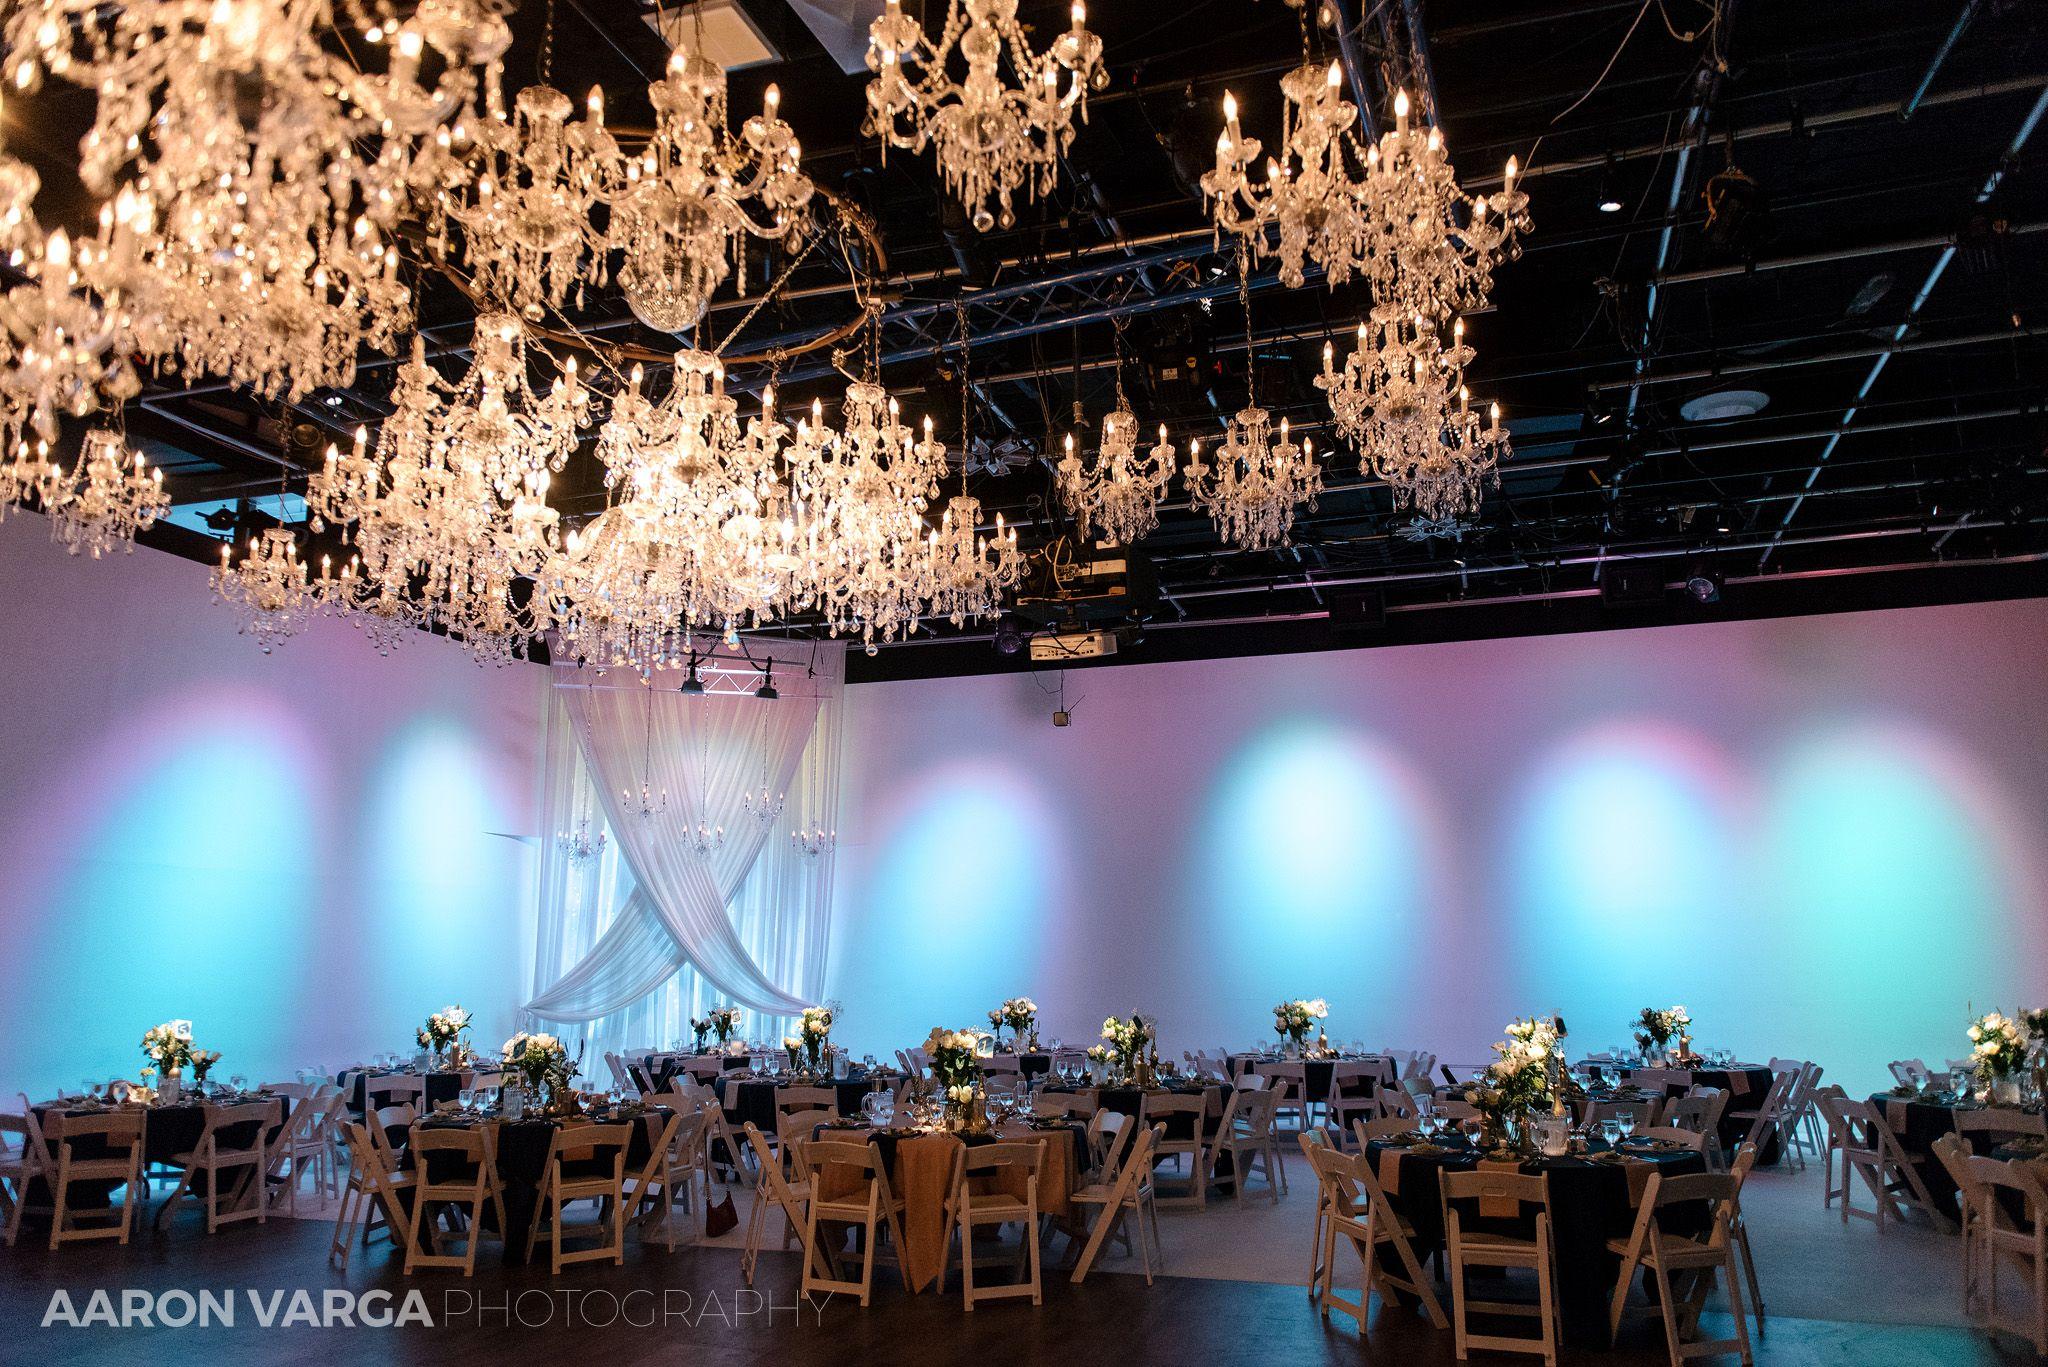 Aaron Varga Photography Pittsburgh Wedding Photographer J Verno Studios